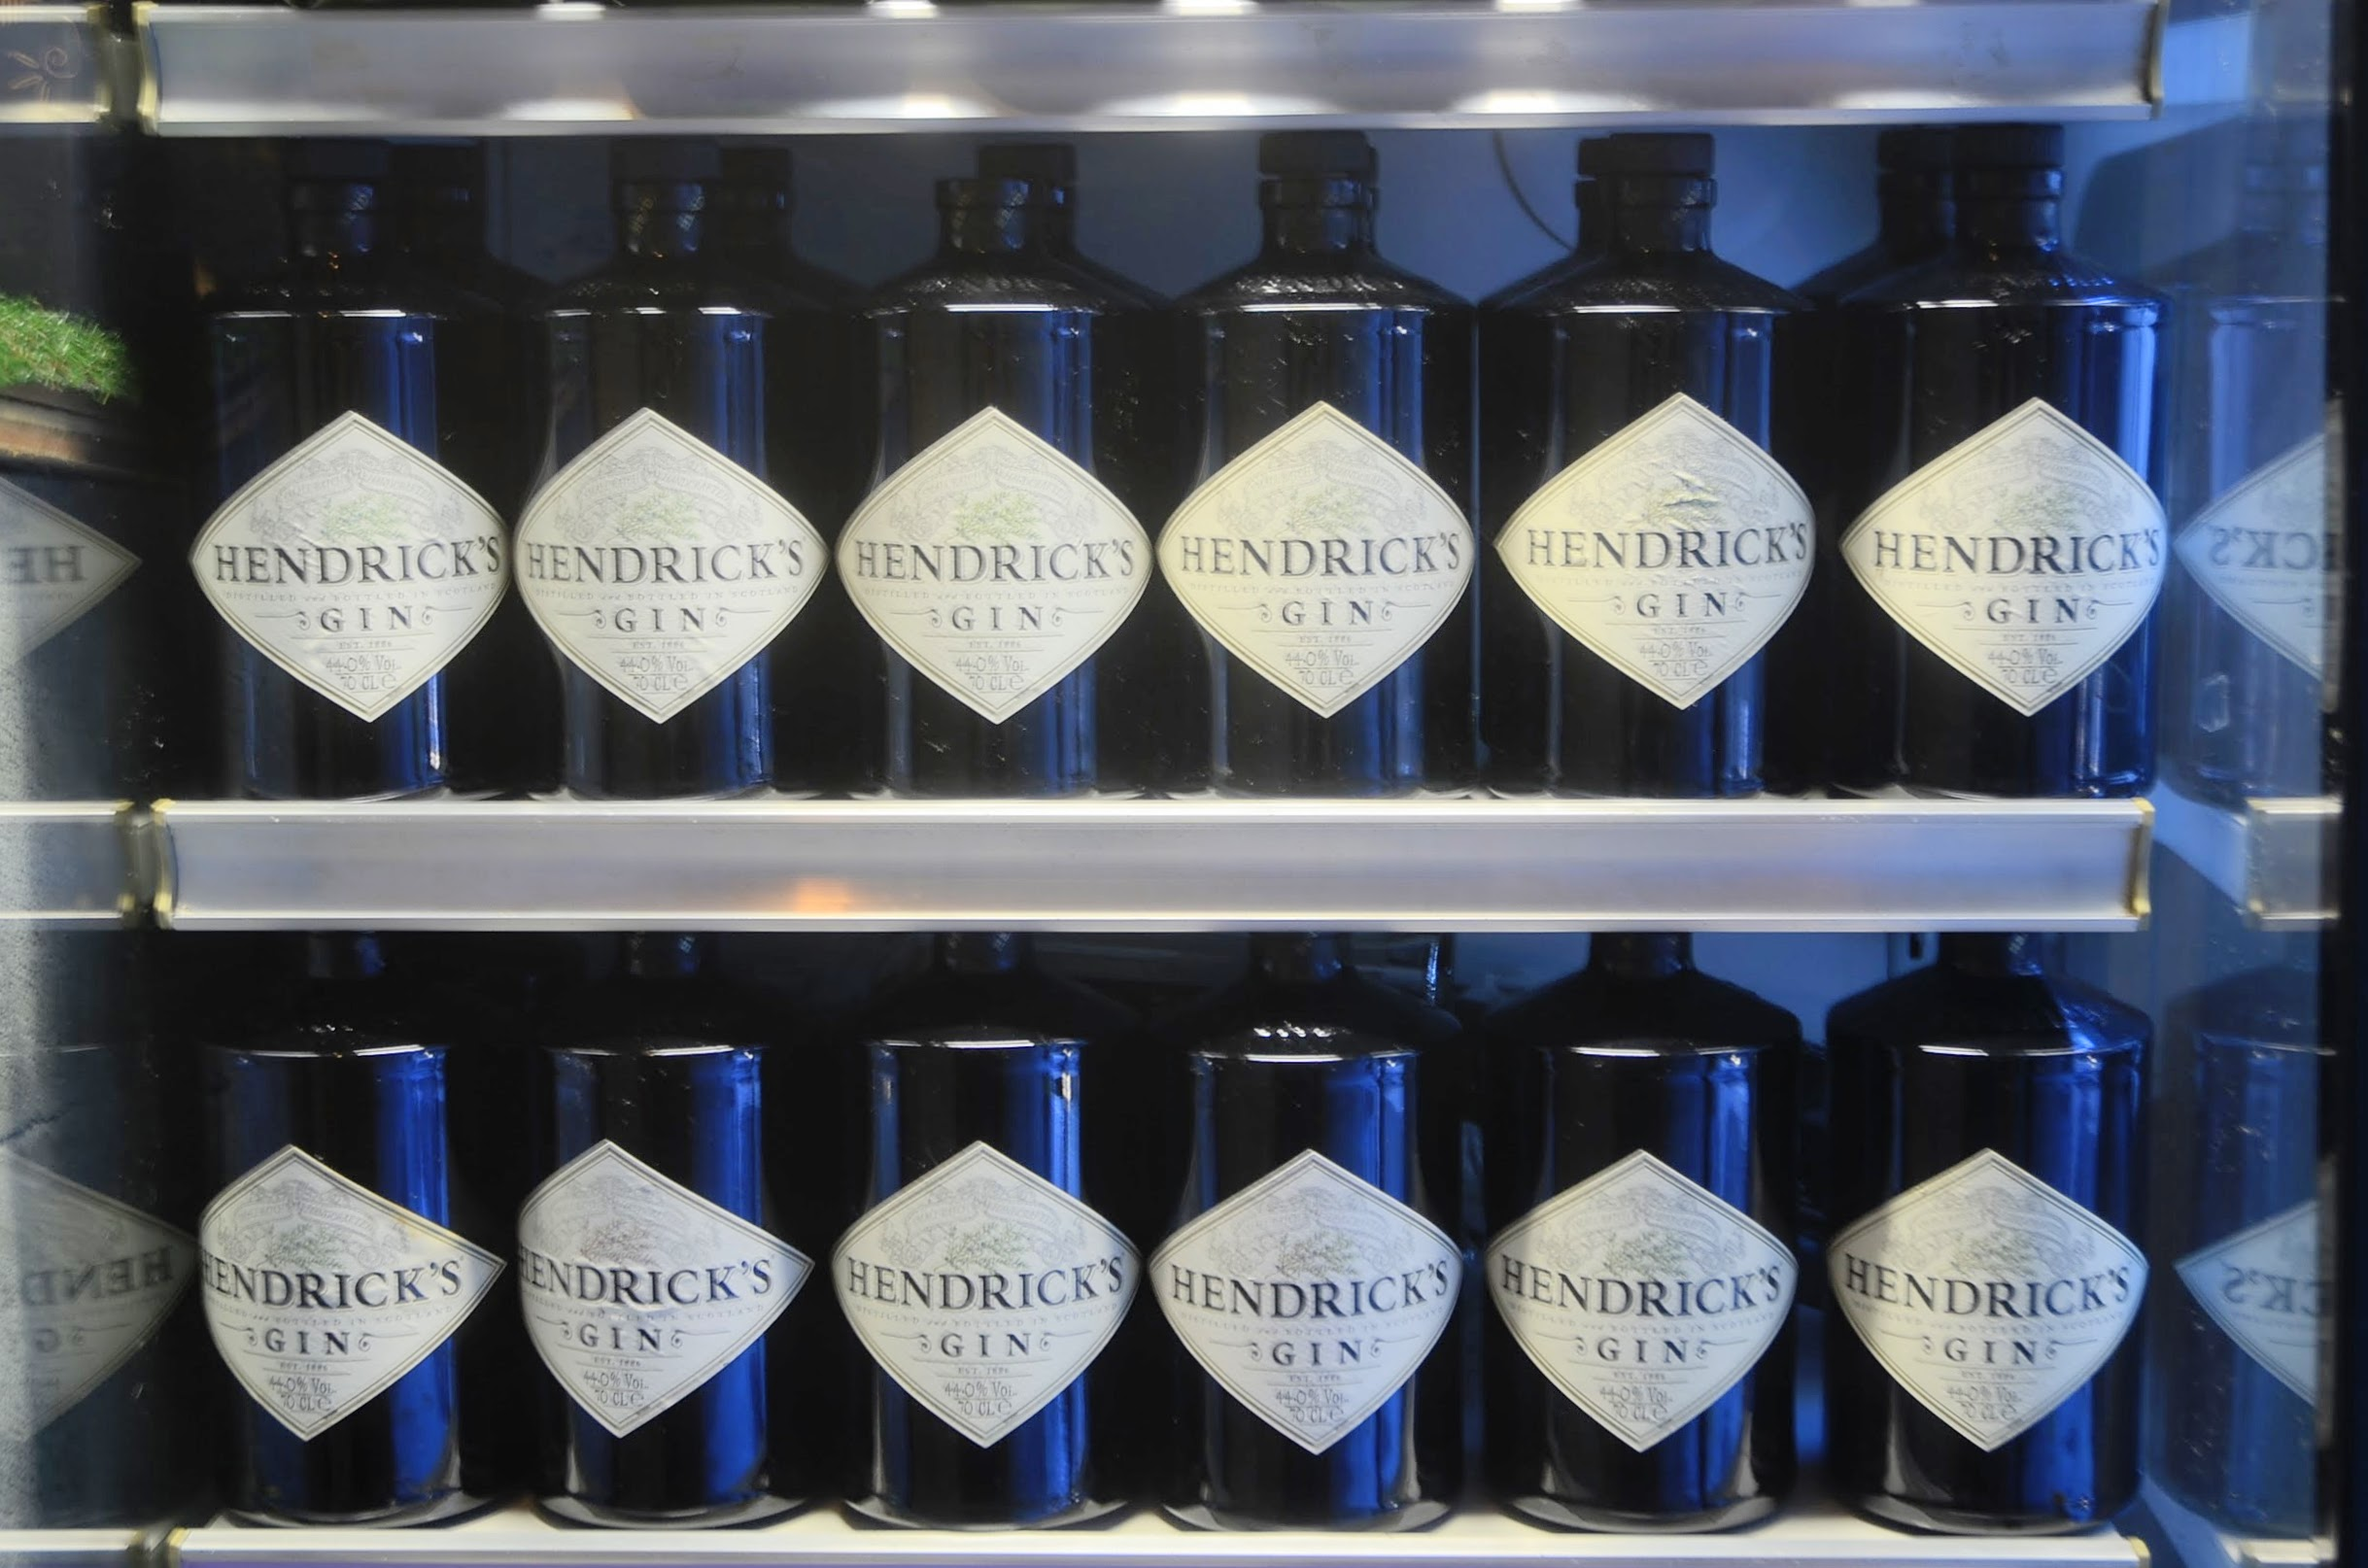 HENDRICK'S GIN /ヘンドリックス ジン